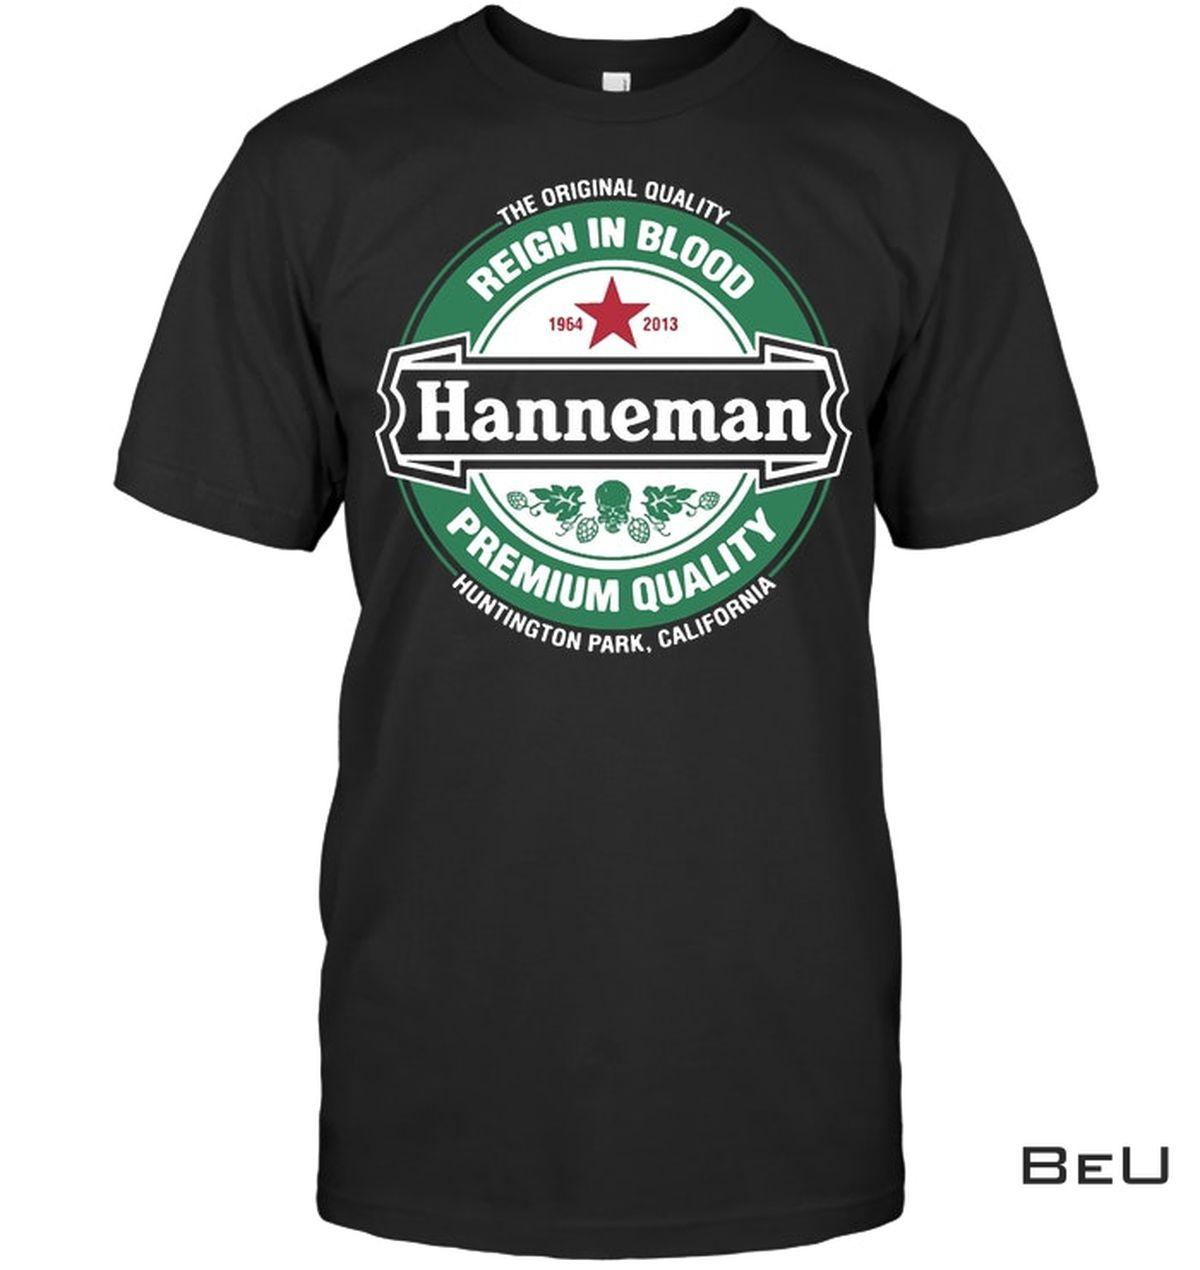 Drop Shipping The Original Quality Reign In Blood Hanneman Shirt, Hoodie, Tank Top